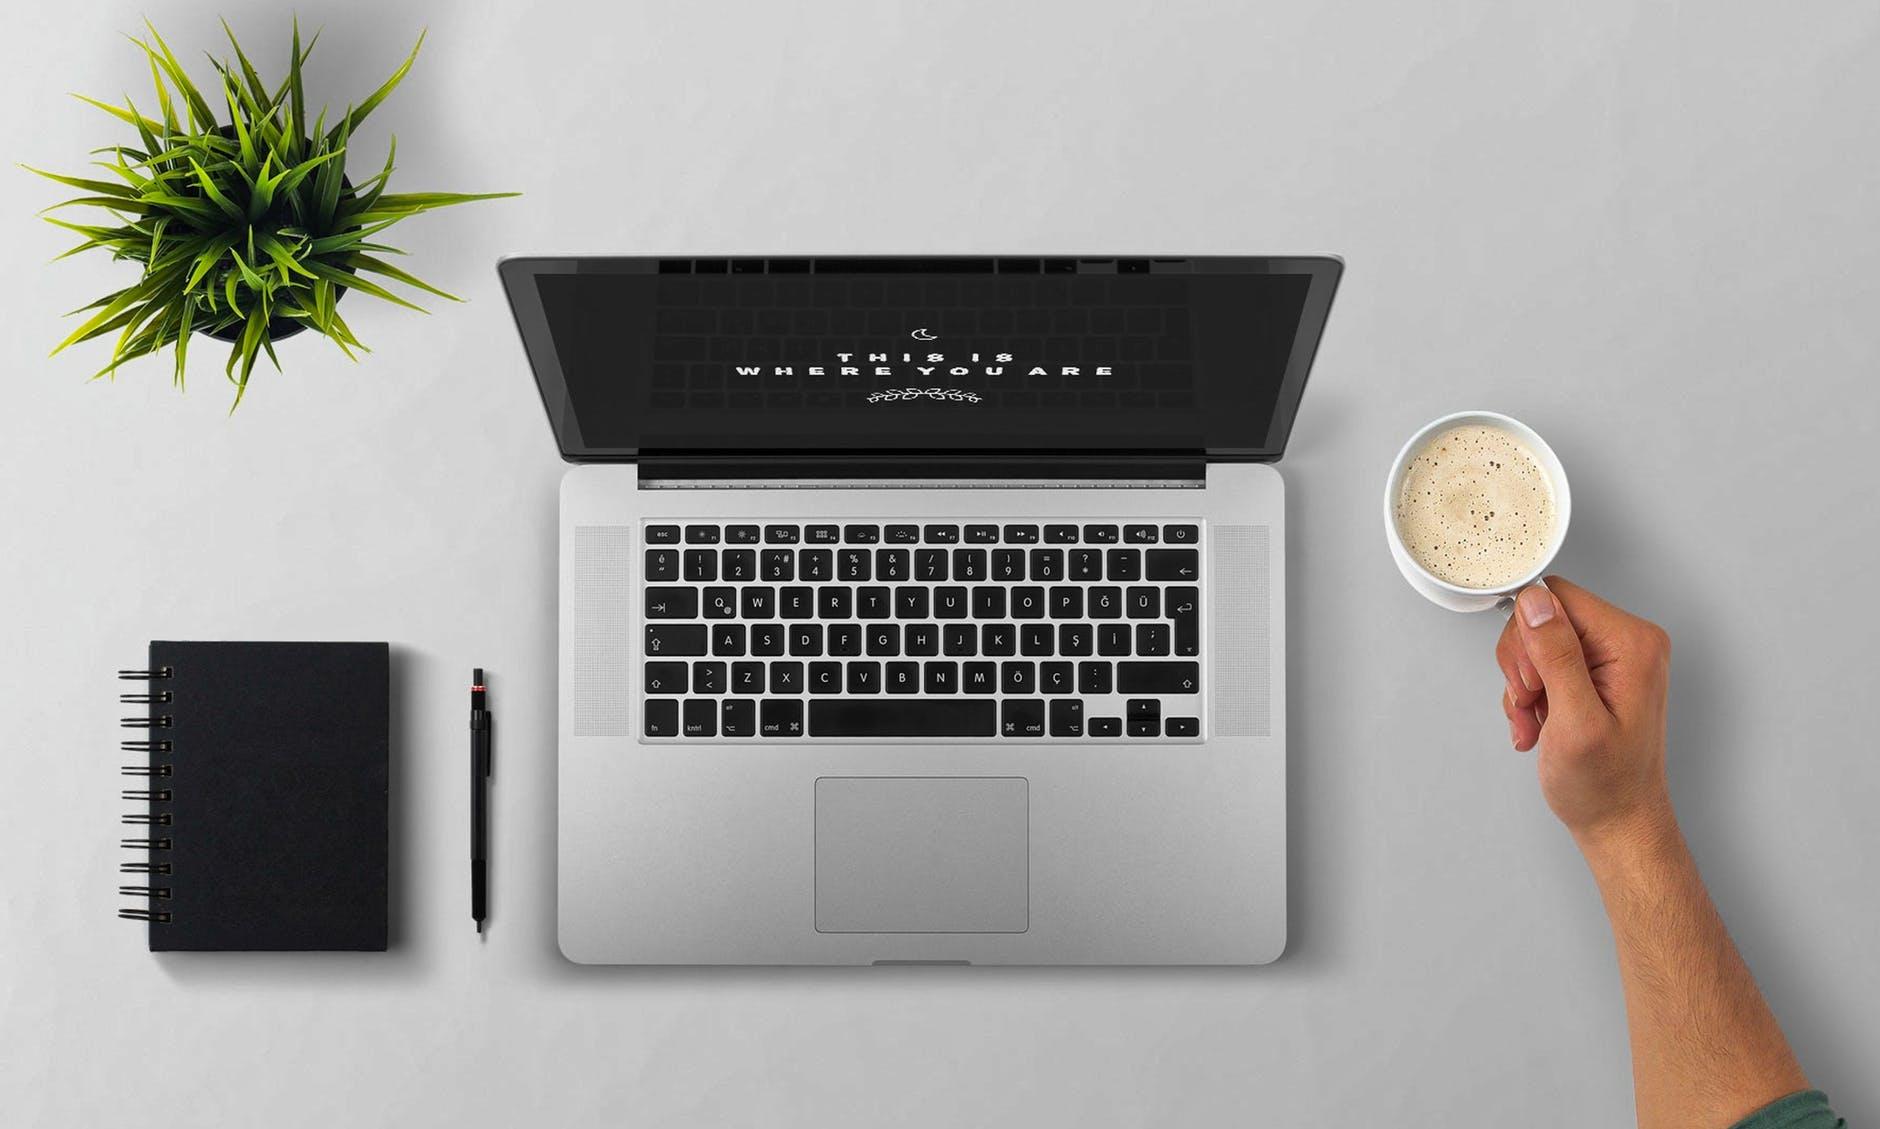 Wordpress,Website Setup,Woocommerce,Ecommerce,Online Marketing,Digital Marketing,Web Design,Online Shopping,Online Shop,Webhosting,CyberSecurity,Maintenance,web developer,software developer,designer,development,support,open source,shoplify,wix,magento,US,USA,UK,Australia,New Zealand,nconsult,singapore.